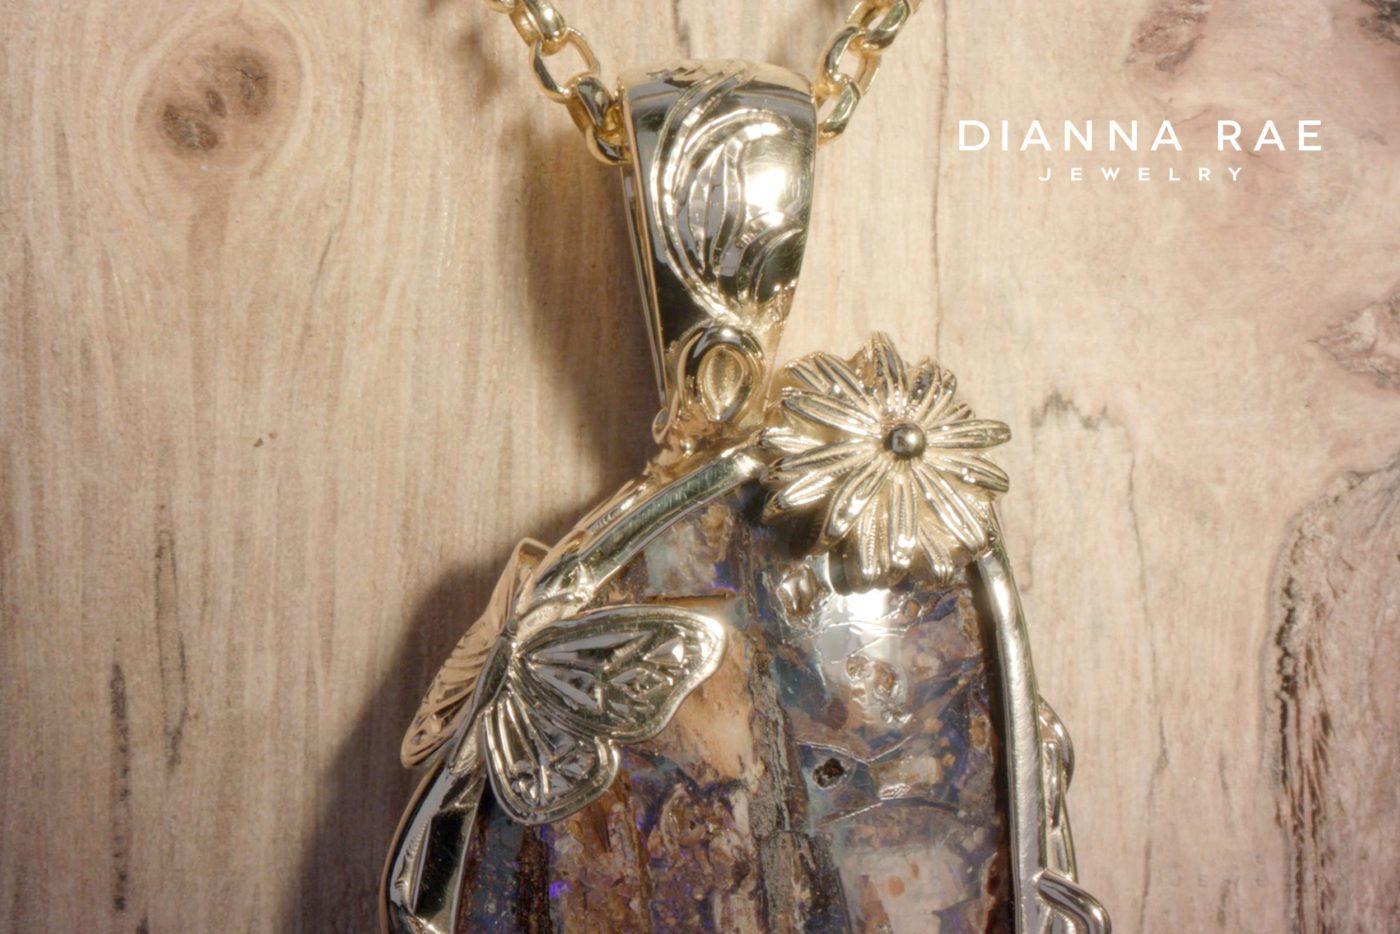 Pendant Jewellery Making Stone 11 Carat Excellent Quality Natural Blue Boulder Opal Gemstone 2544 Hand Cut Australian Opal Koroit Opal